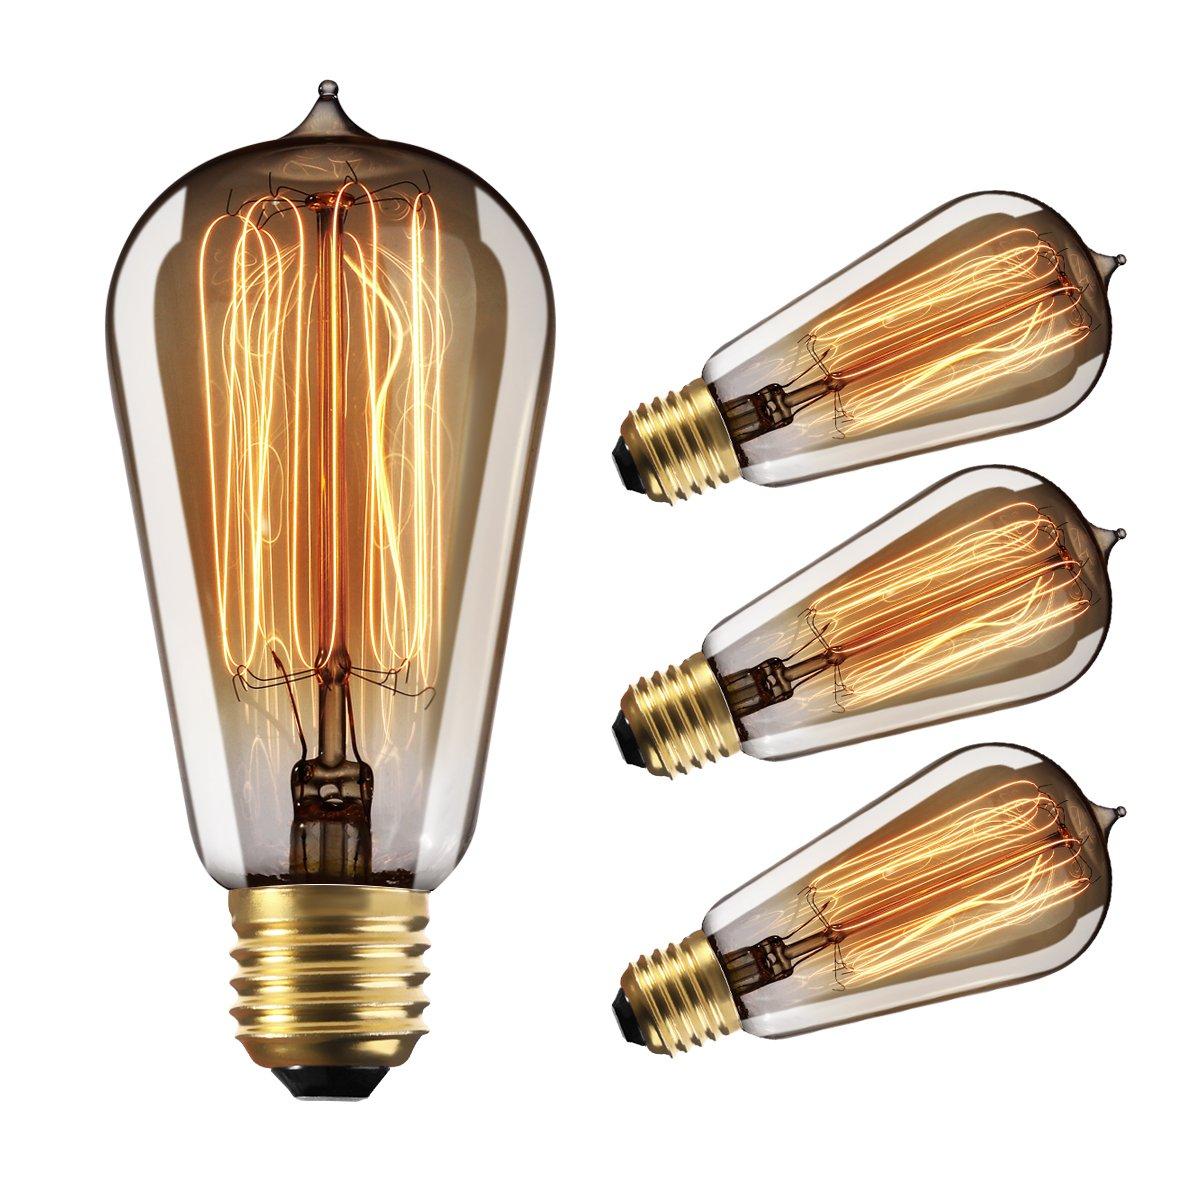 Edison Bulbs Dimmable, YUNLIGHTS 60W Vintage Light Bulbs, Thomas Antique Retro Old Filament Bulb, E26 ST58 110-130V 2500-2700K Warm White, 4 Pack